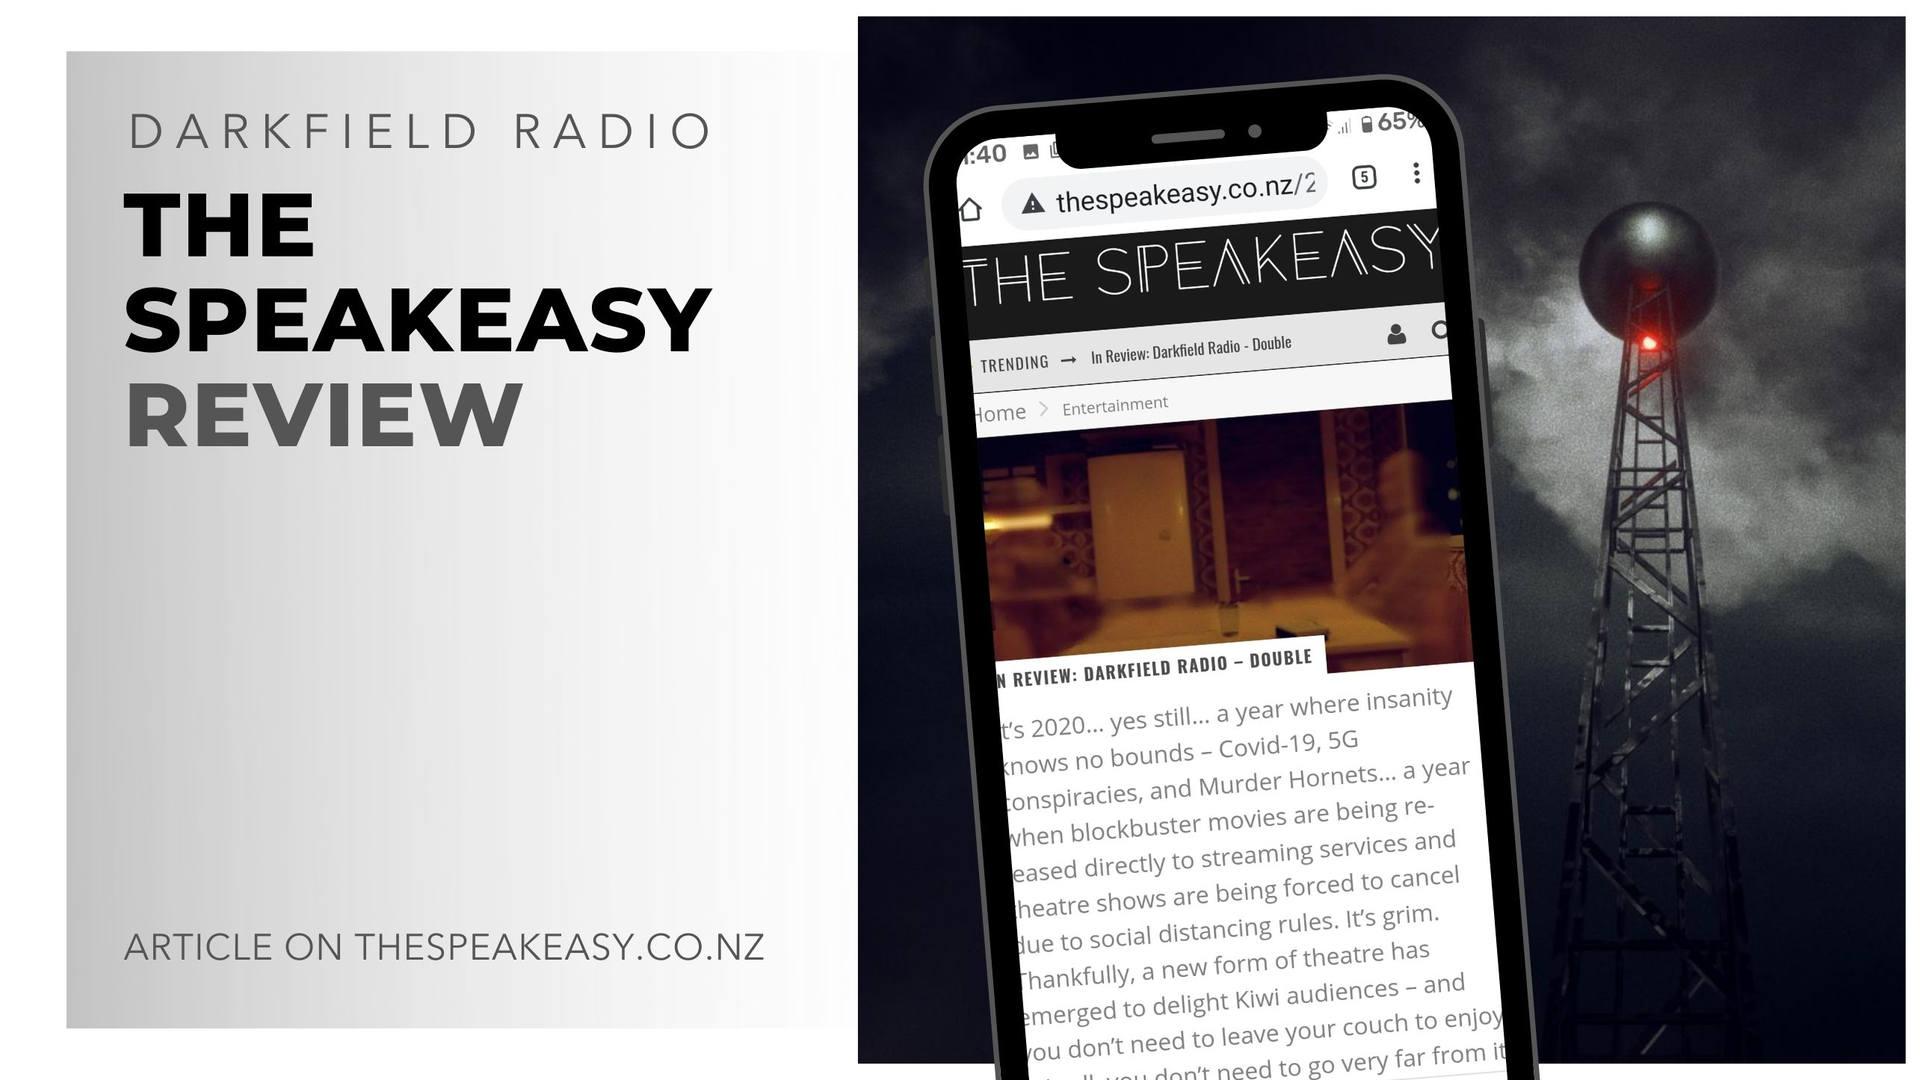 the speakeasy review